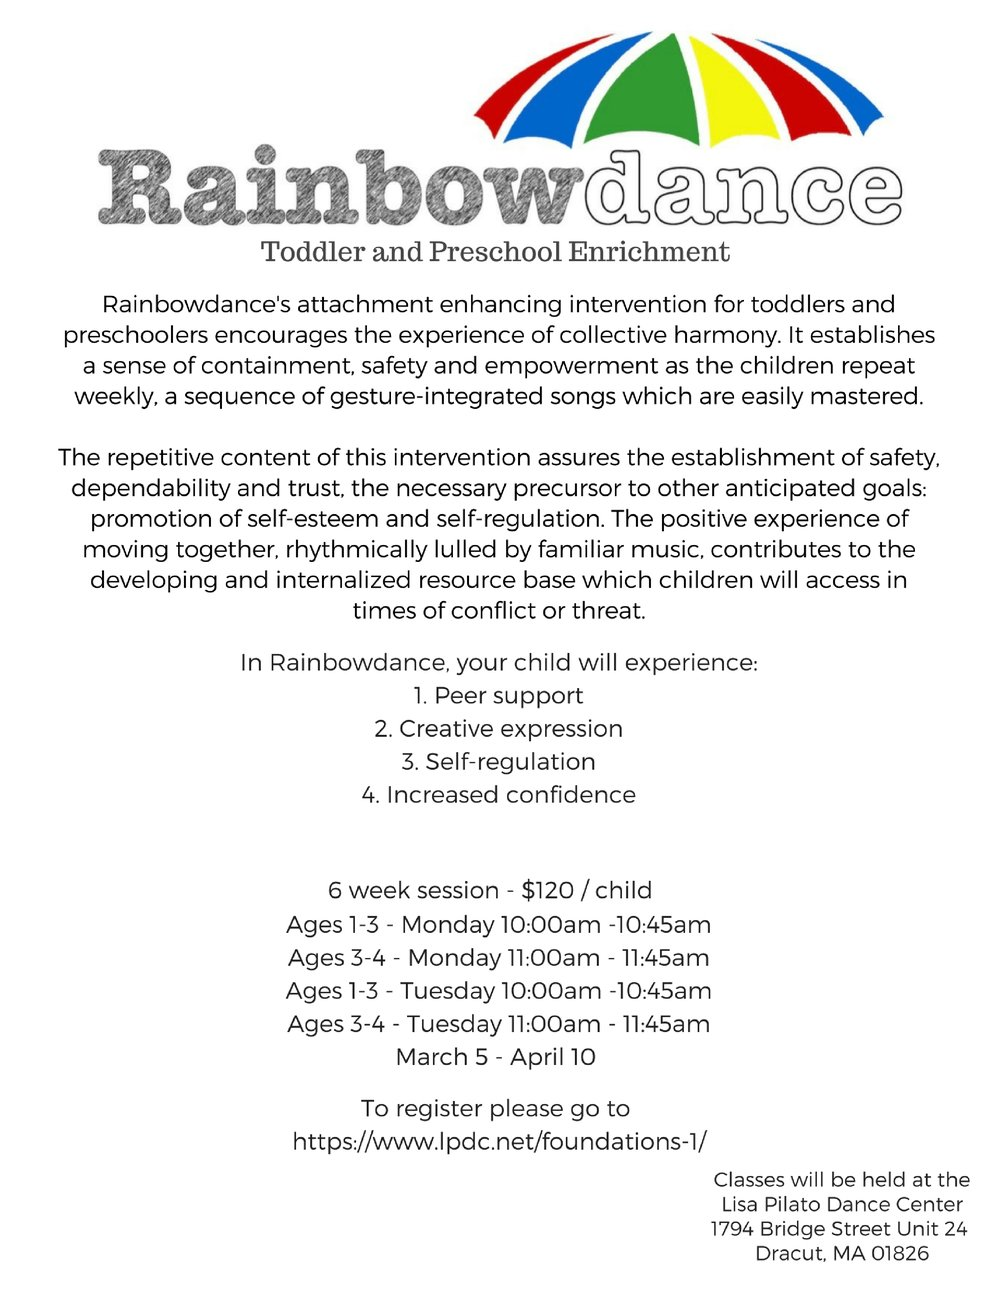 Classes will be held at the Lisa Pilato Dance CenterBridgewood Plaza 1794 Bridge Street Unit 24Dracut, MA 01826978-866-7038-2.jpg